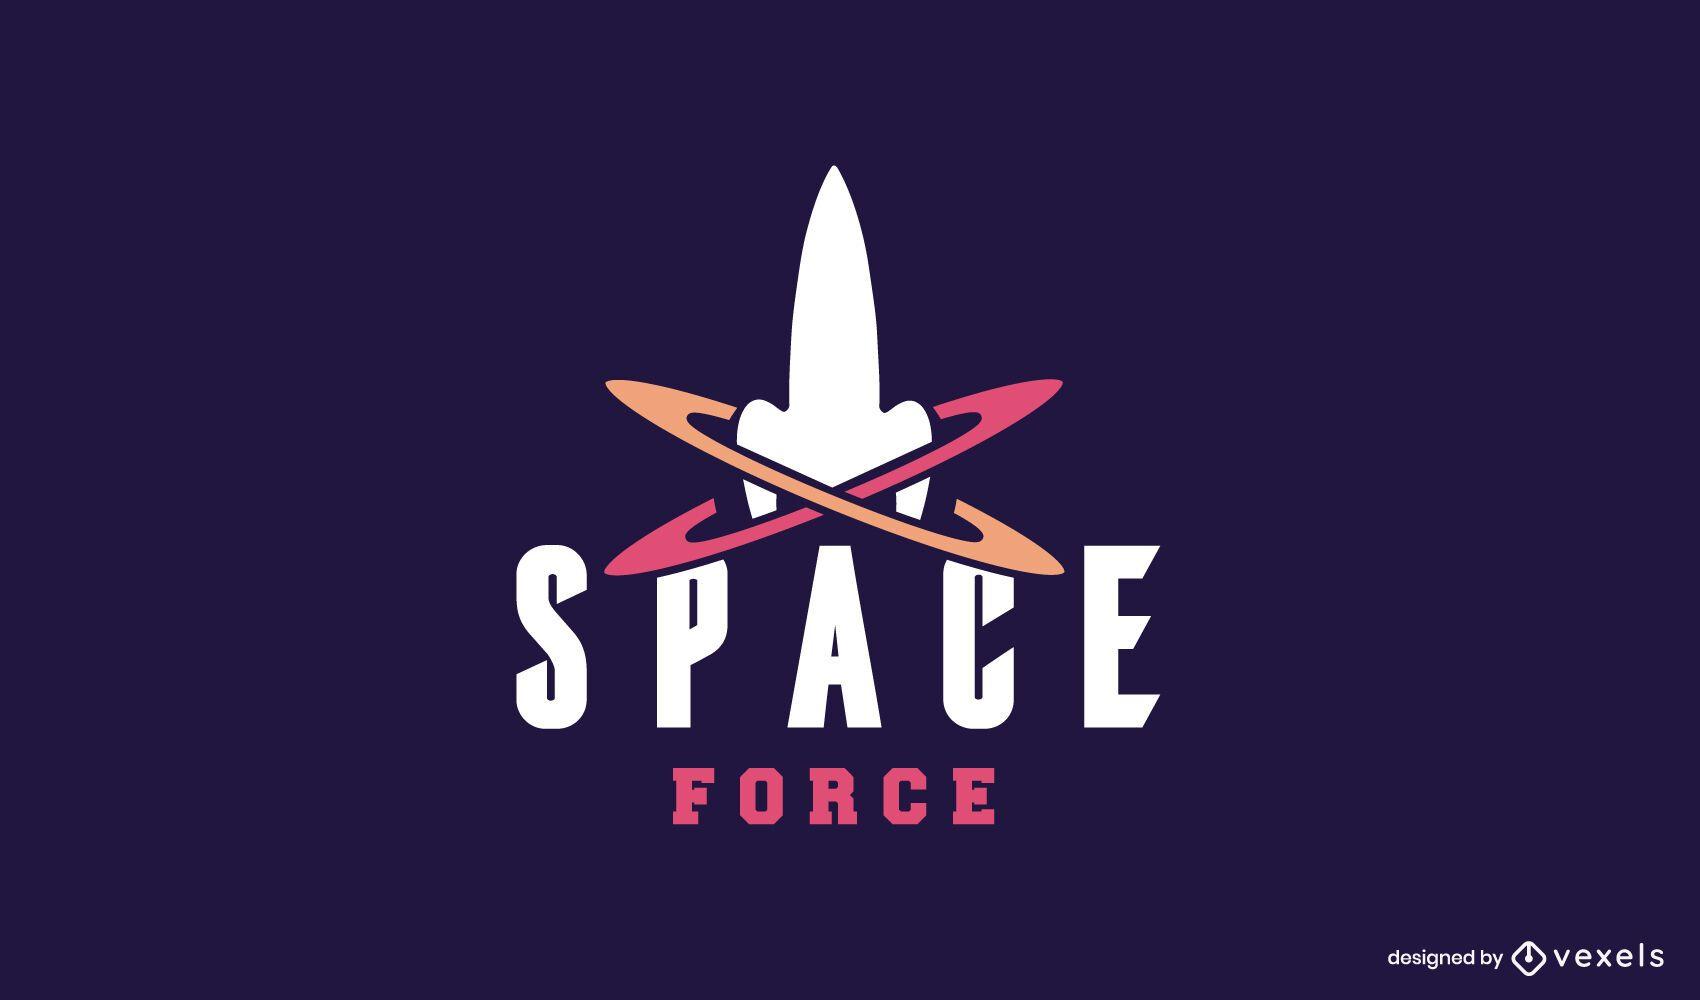 Space force logo design